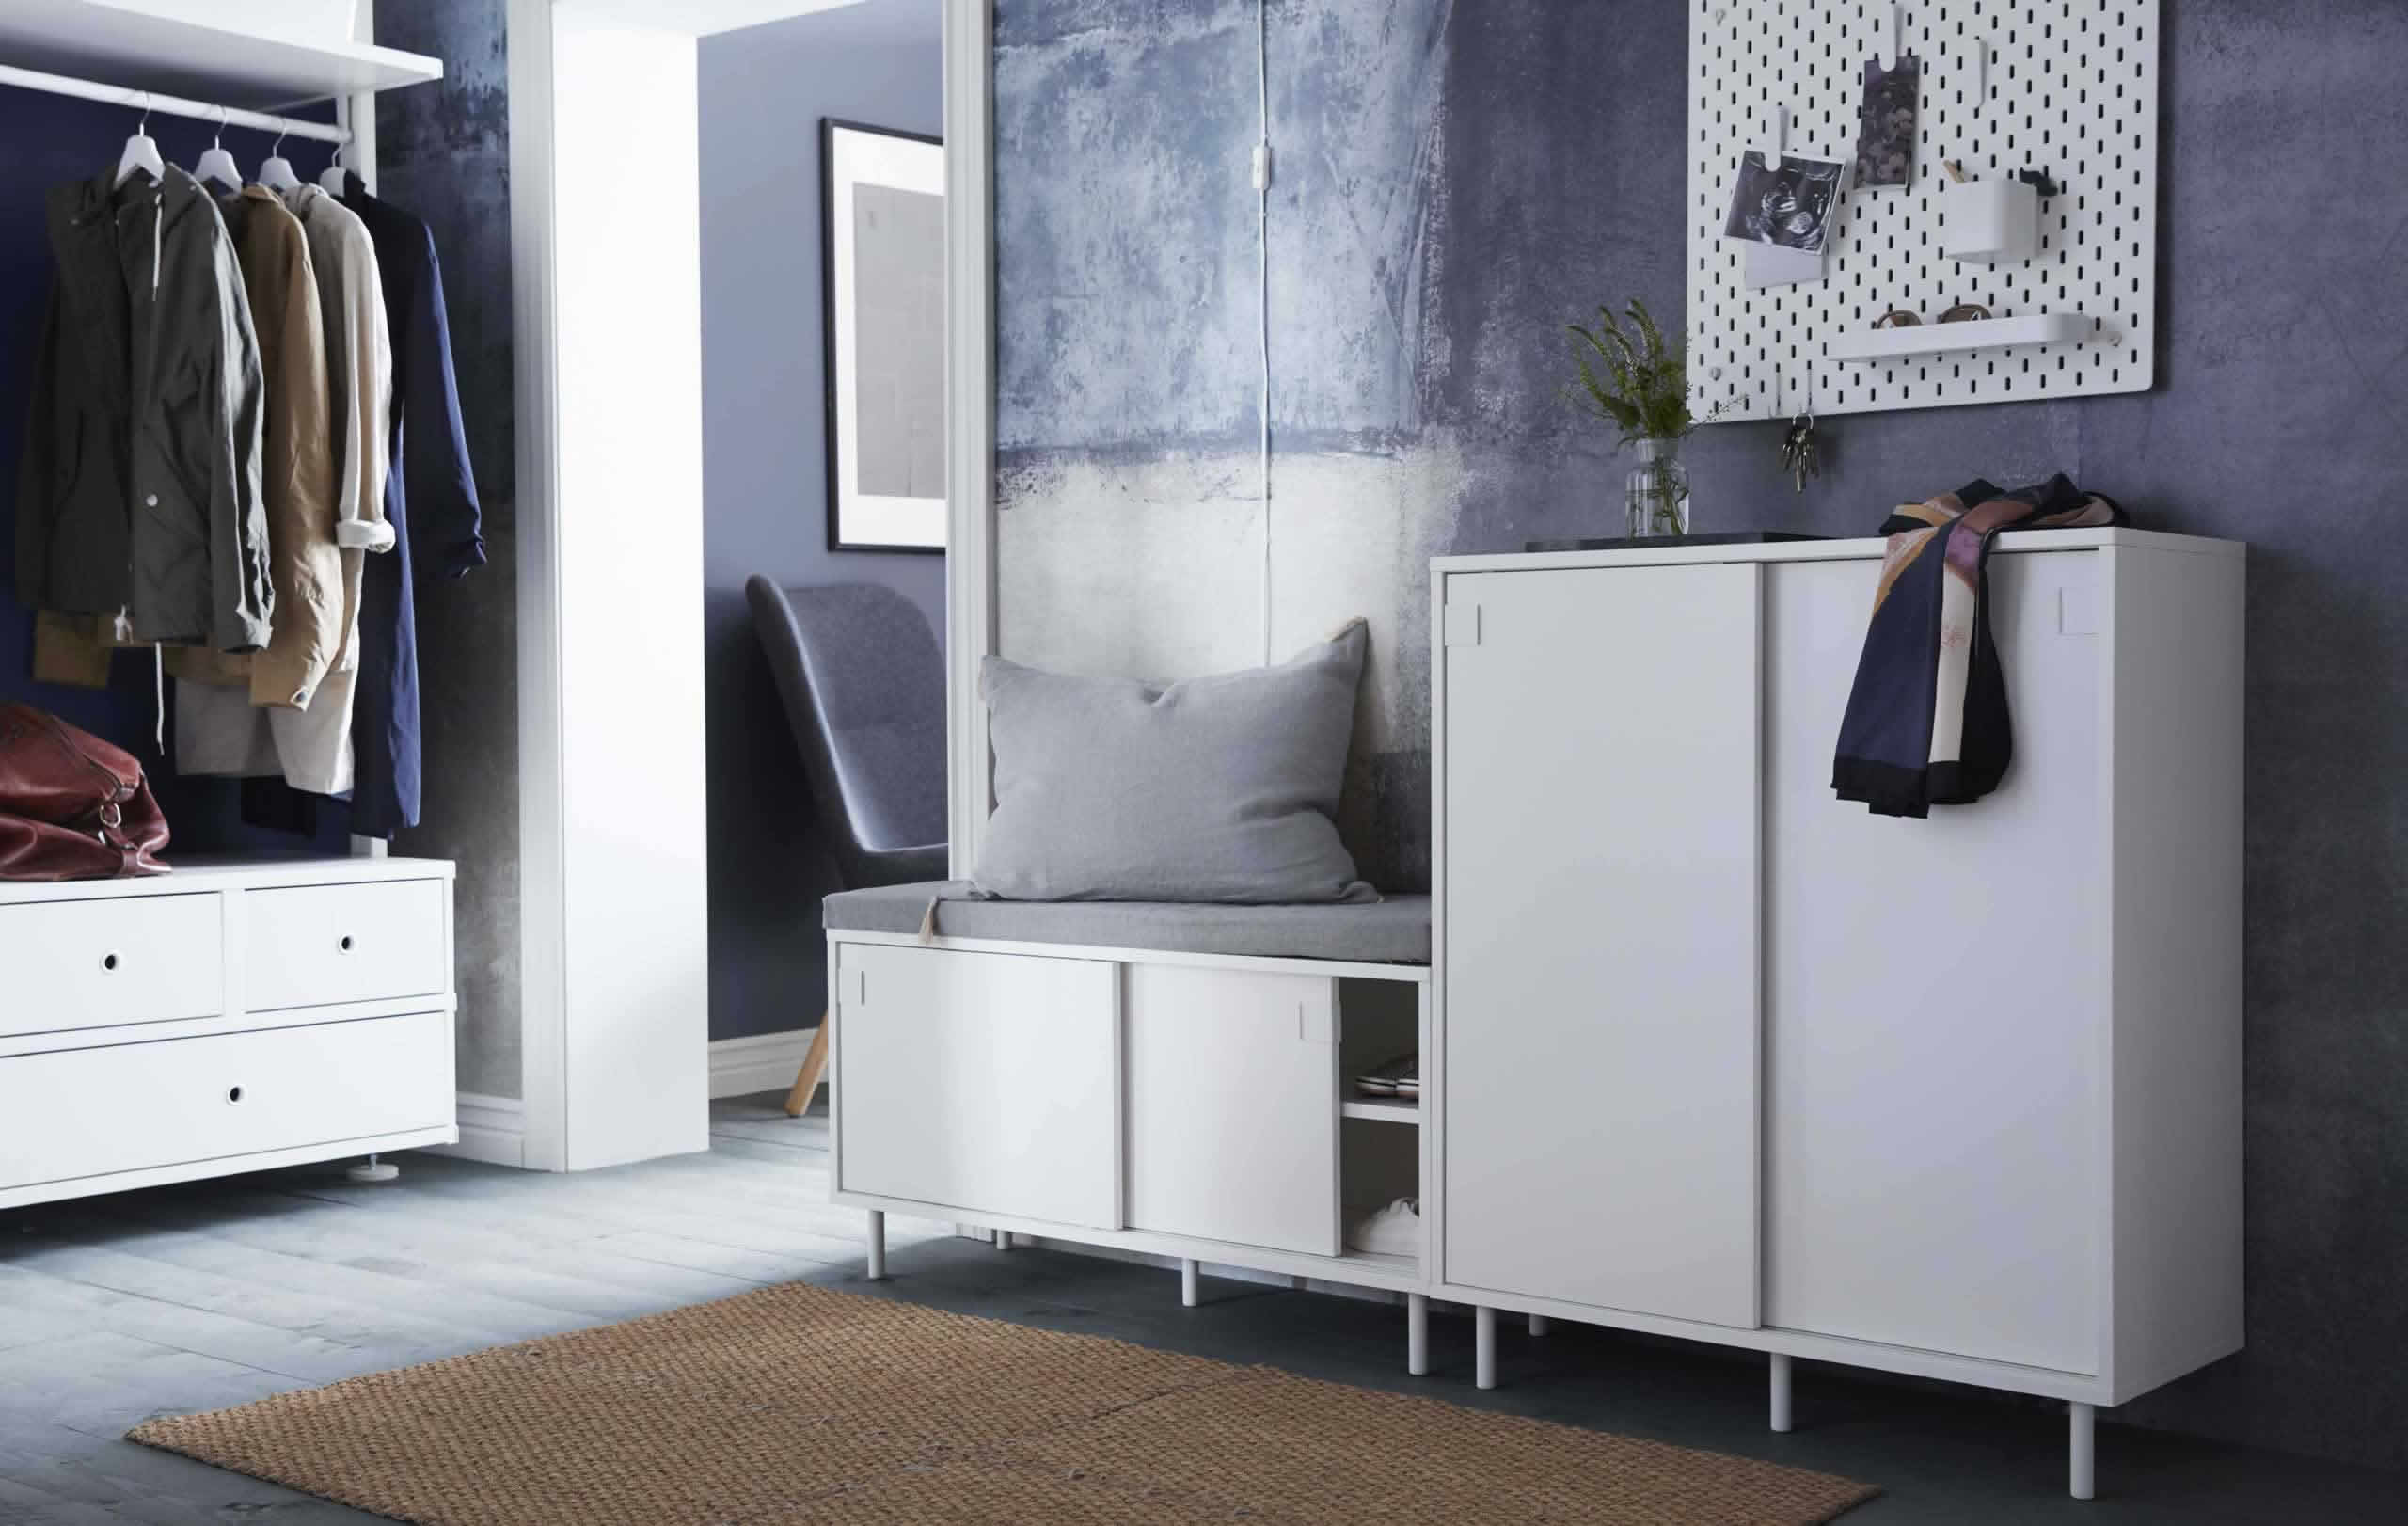 A minimalist family hallway ikea turkey for Minimalist family